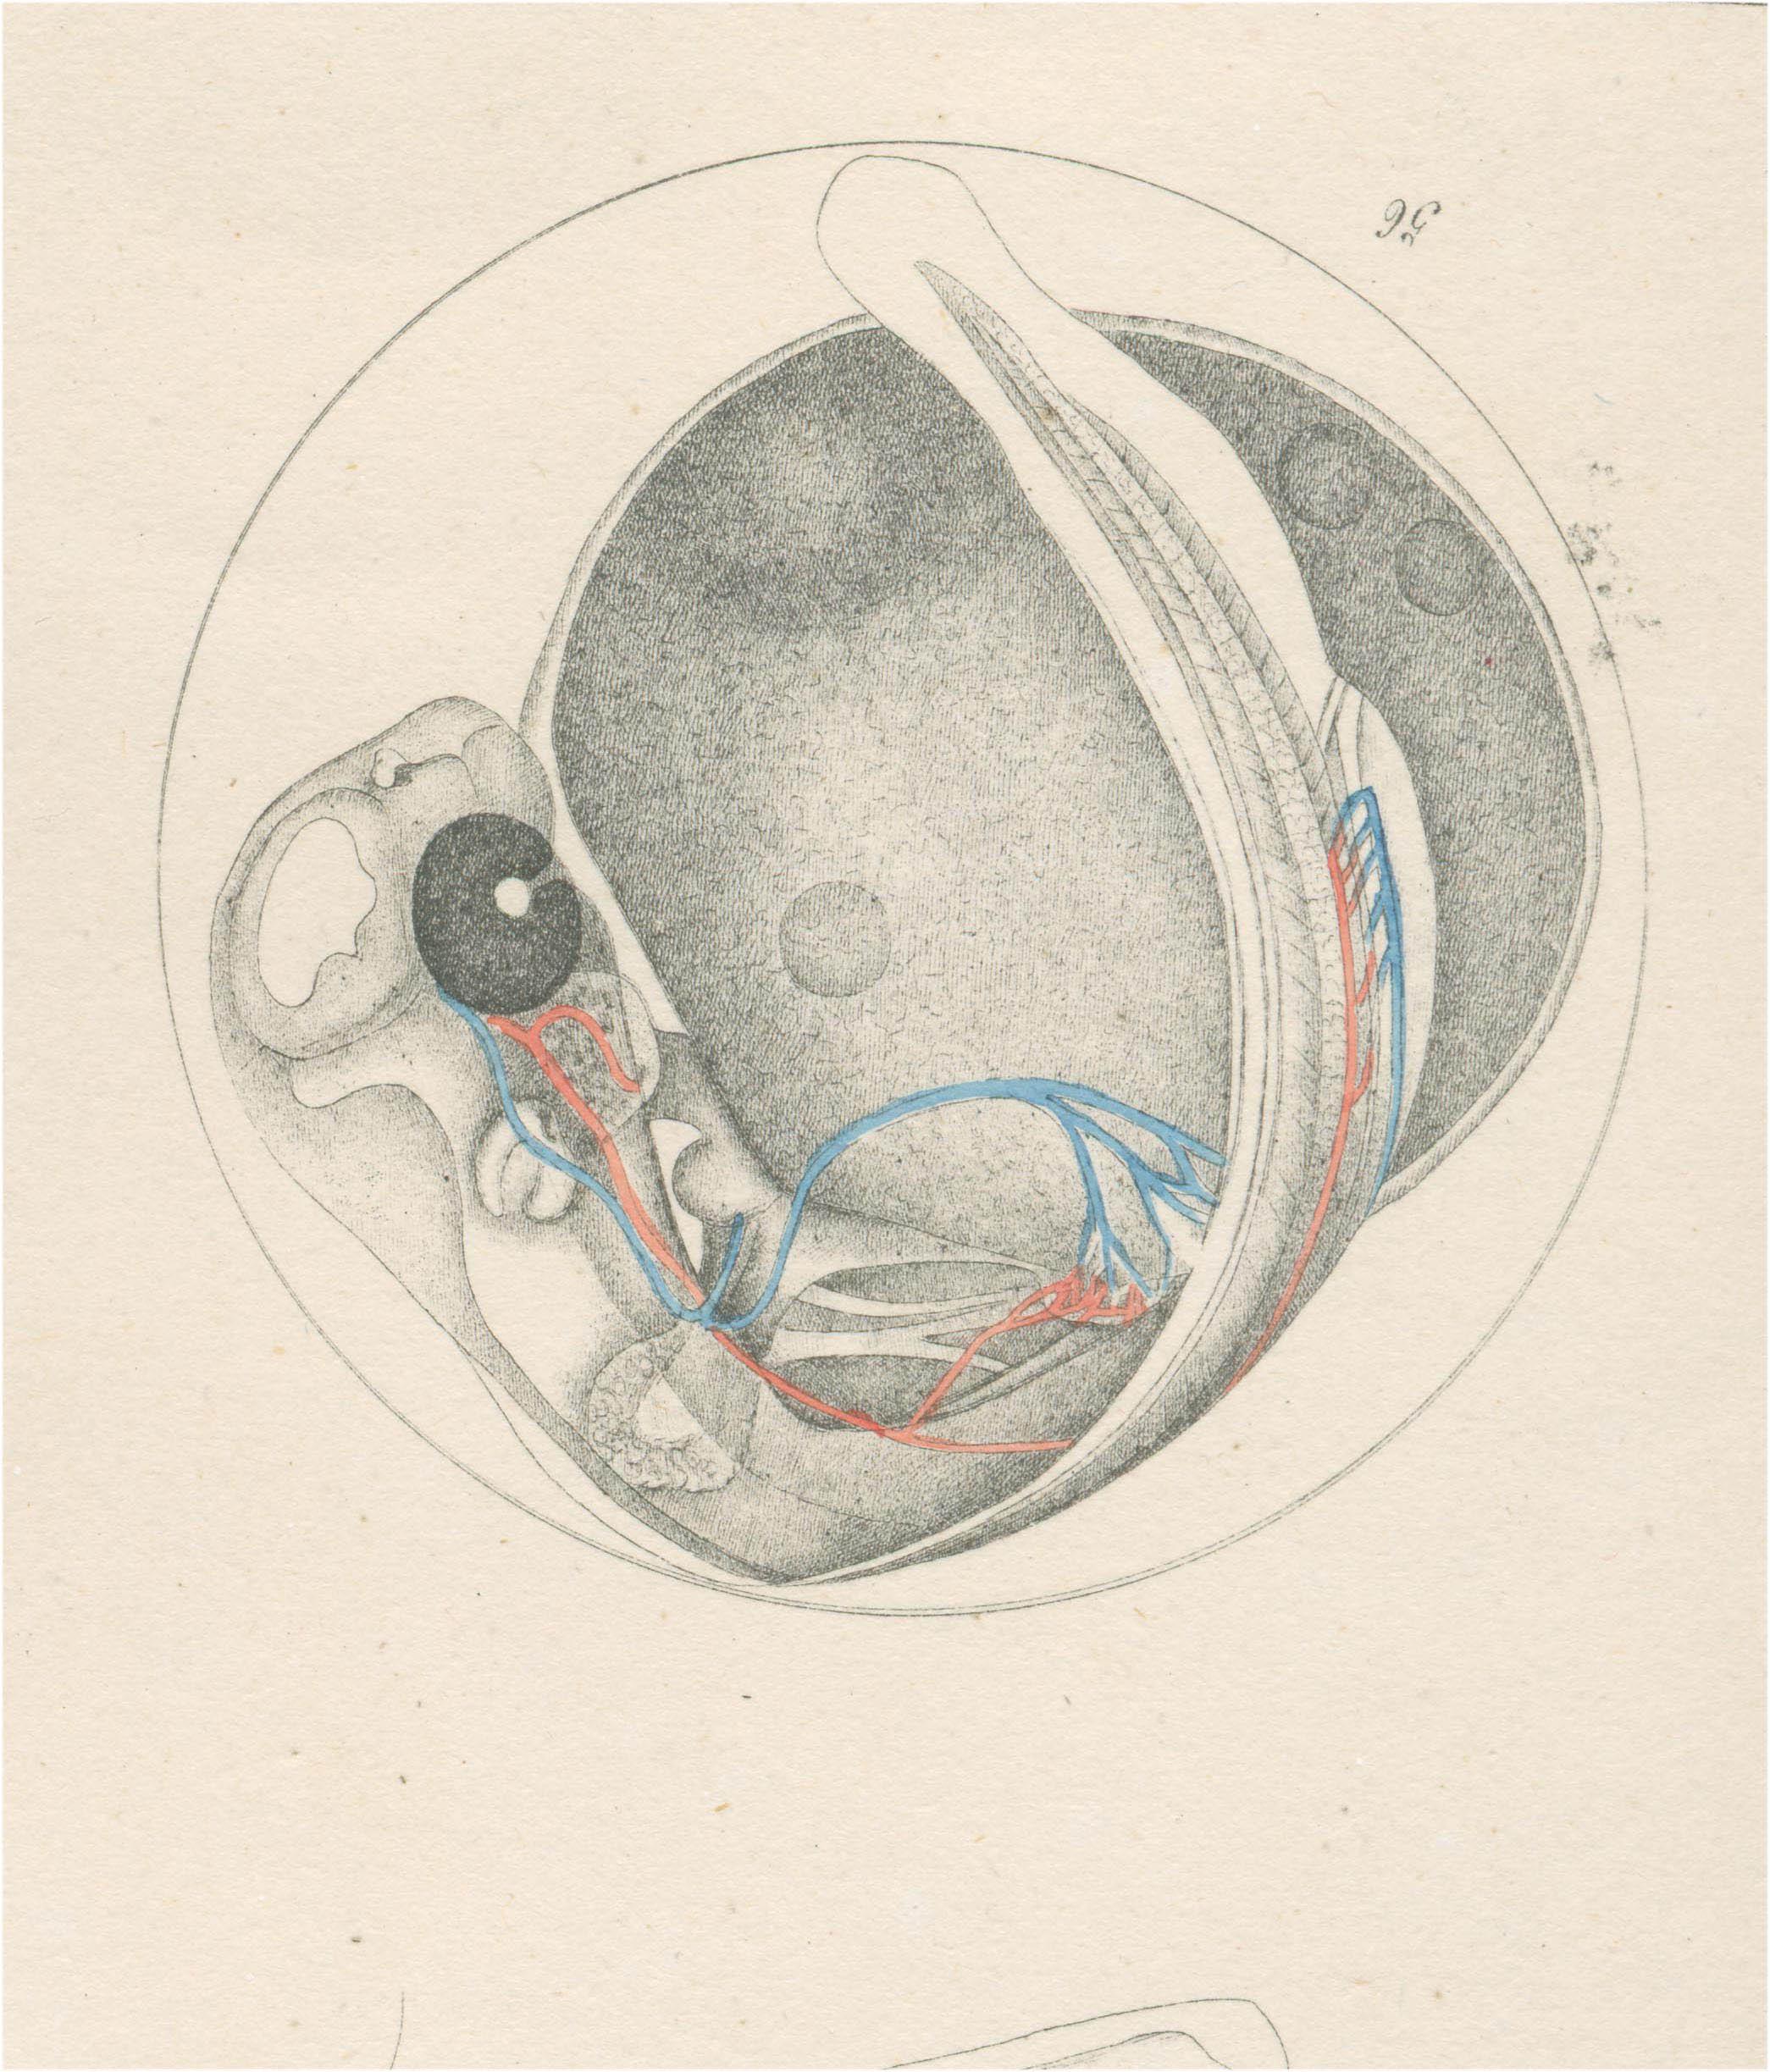 A Salmonid embryo